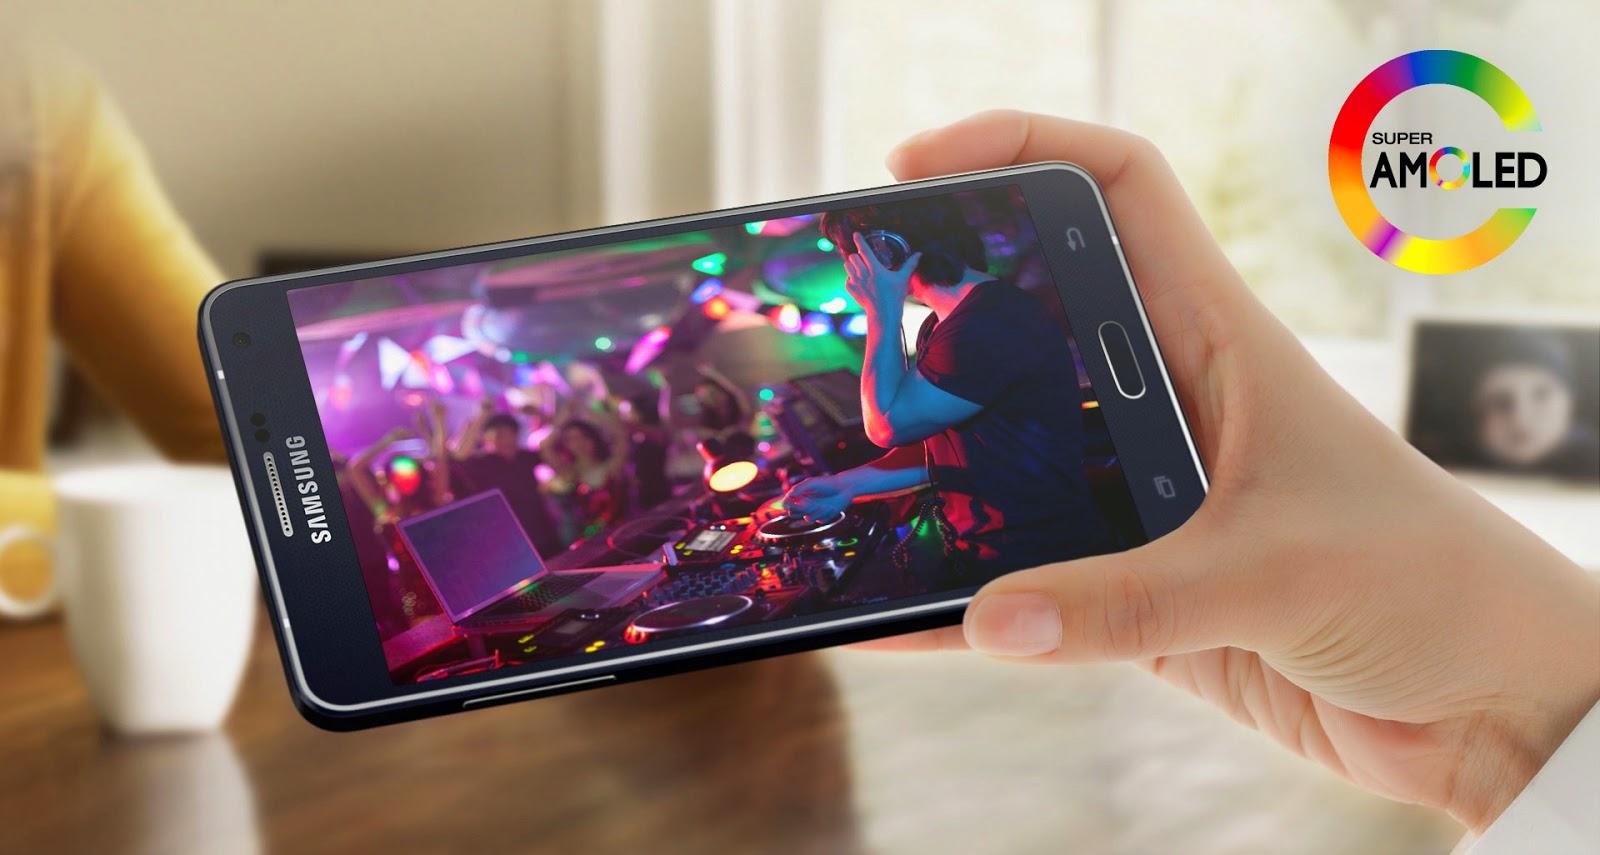 Samsung Galaxy A7 Metallic Phone